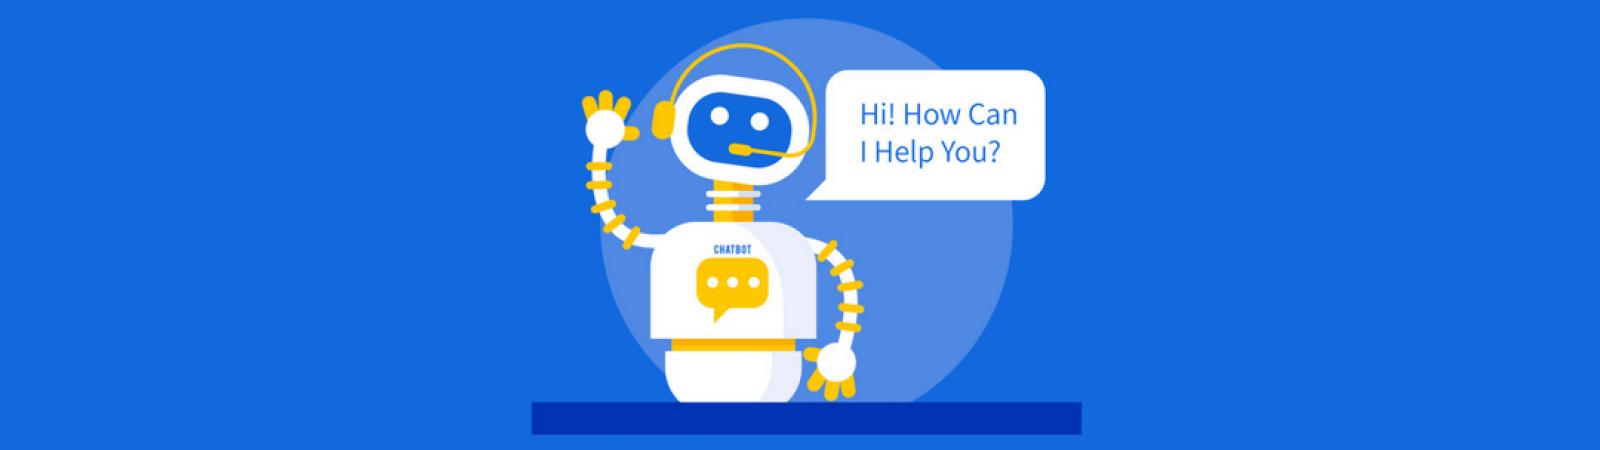 chatbot-blog-banner-72618-1080x359